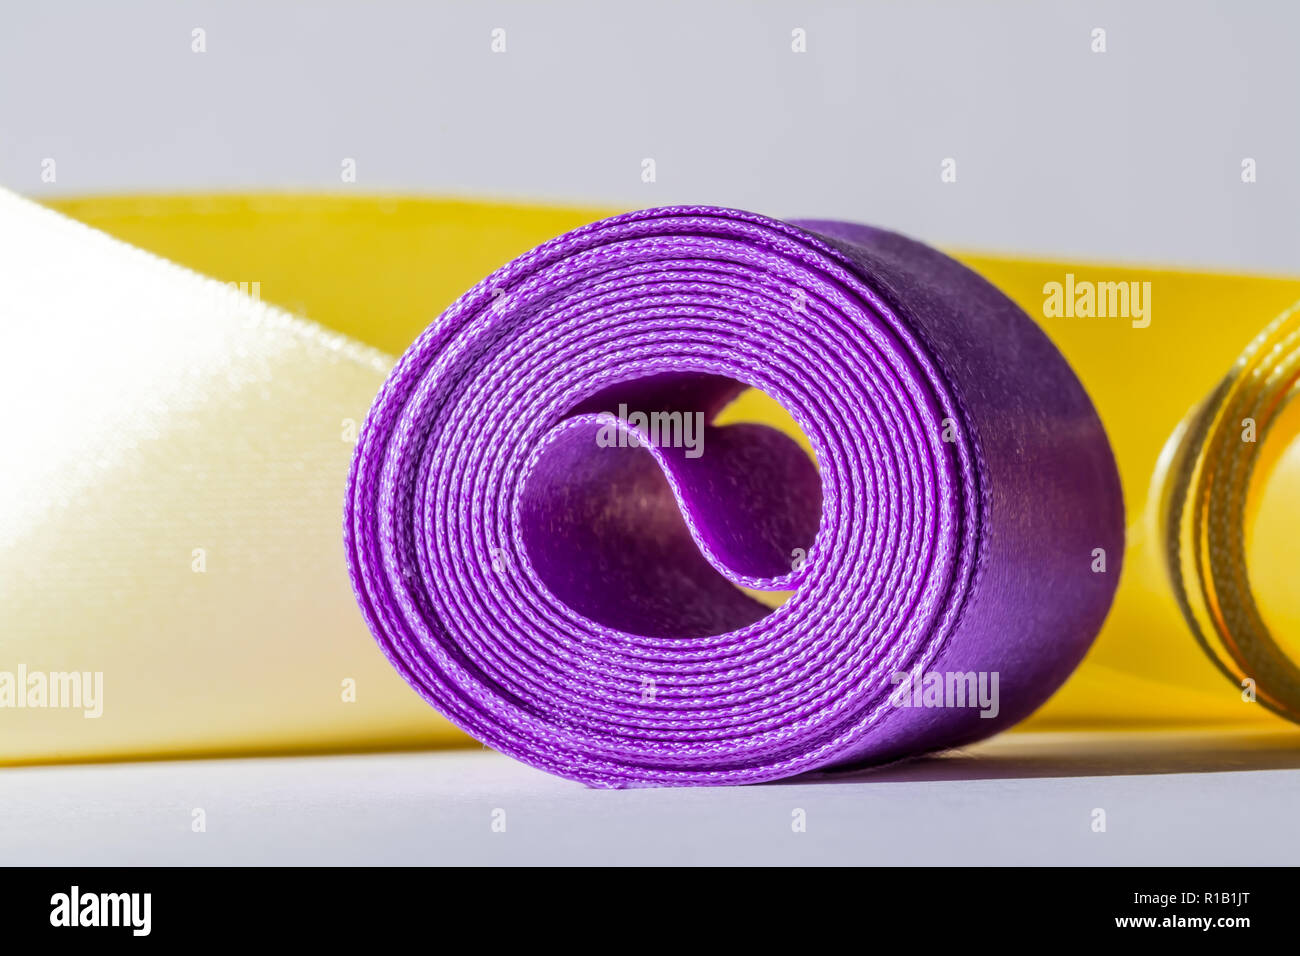 Purple Ribbon Stock Photos & Purple Ribbon Stock Images - Alamy